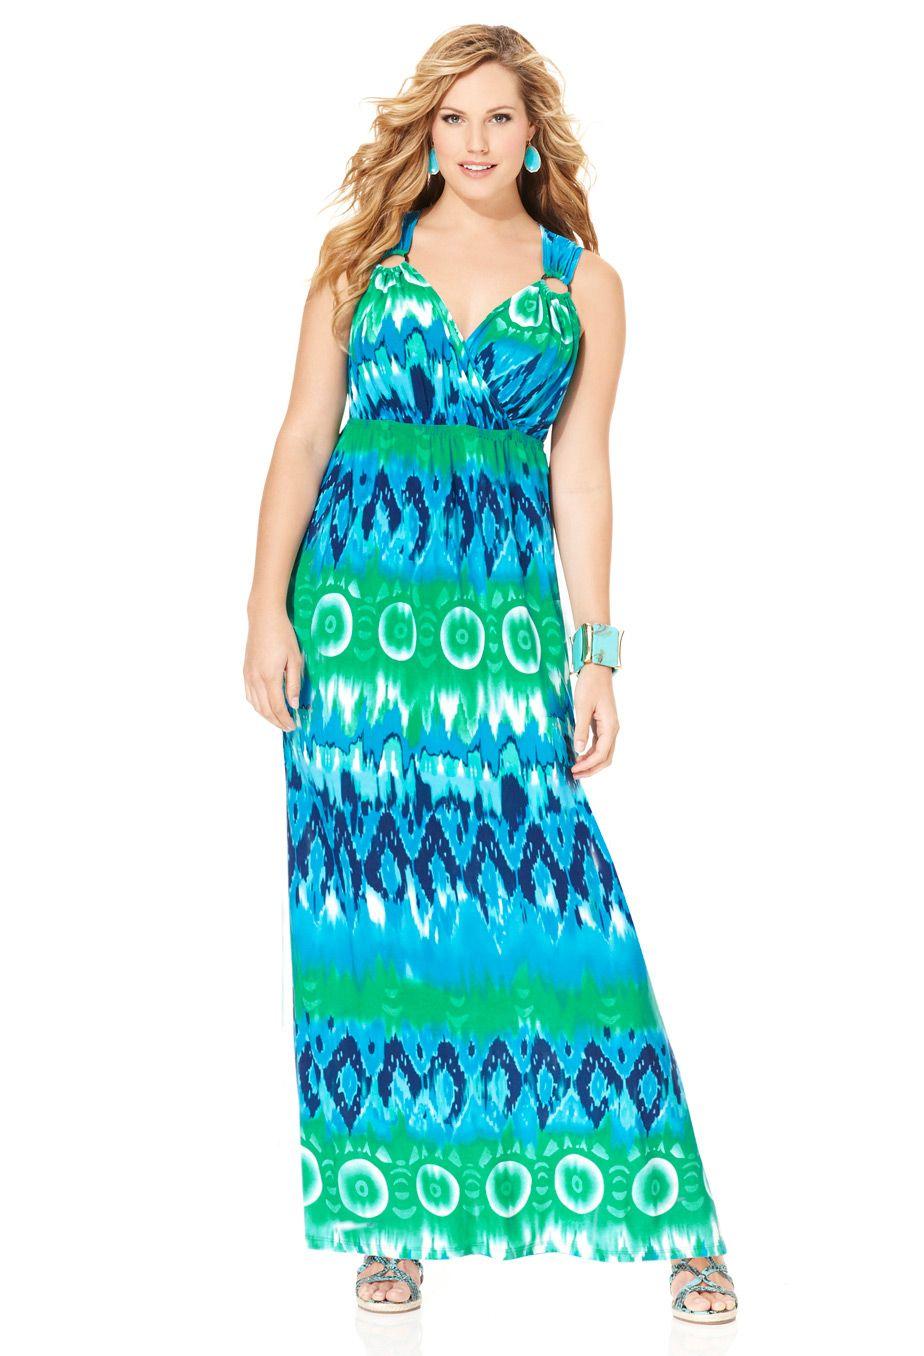 Plus Size Mixed Blue Ring Maxi Dress Plus Size Avenue Clearance Avenue Dresses Plus Size Maxi Dresses Plus Size Fashion [ 1356 x 924 Pixel ]